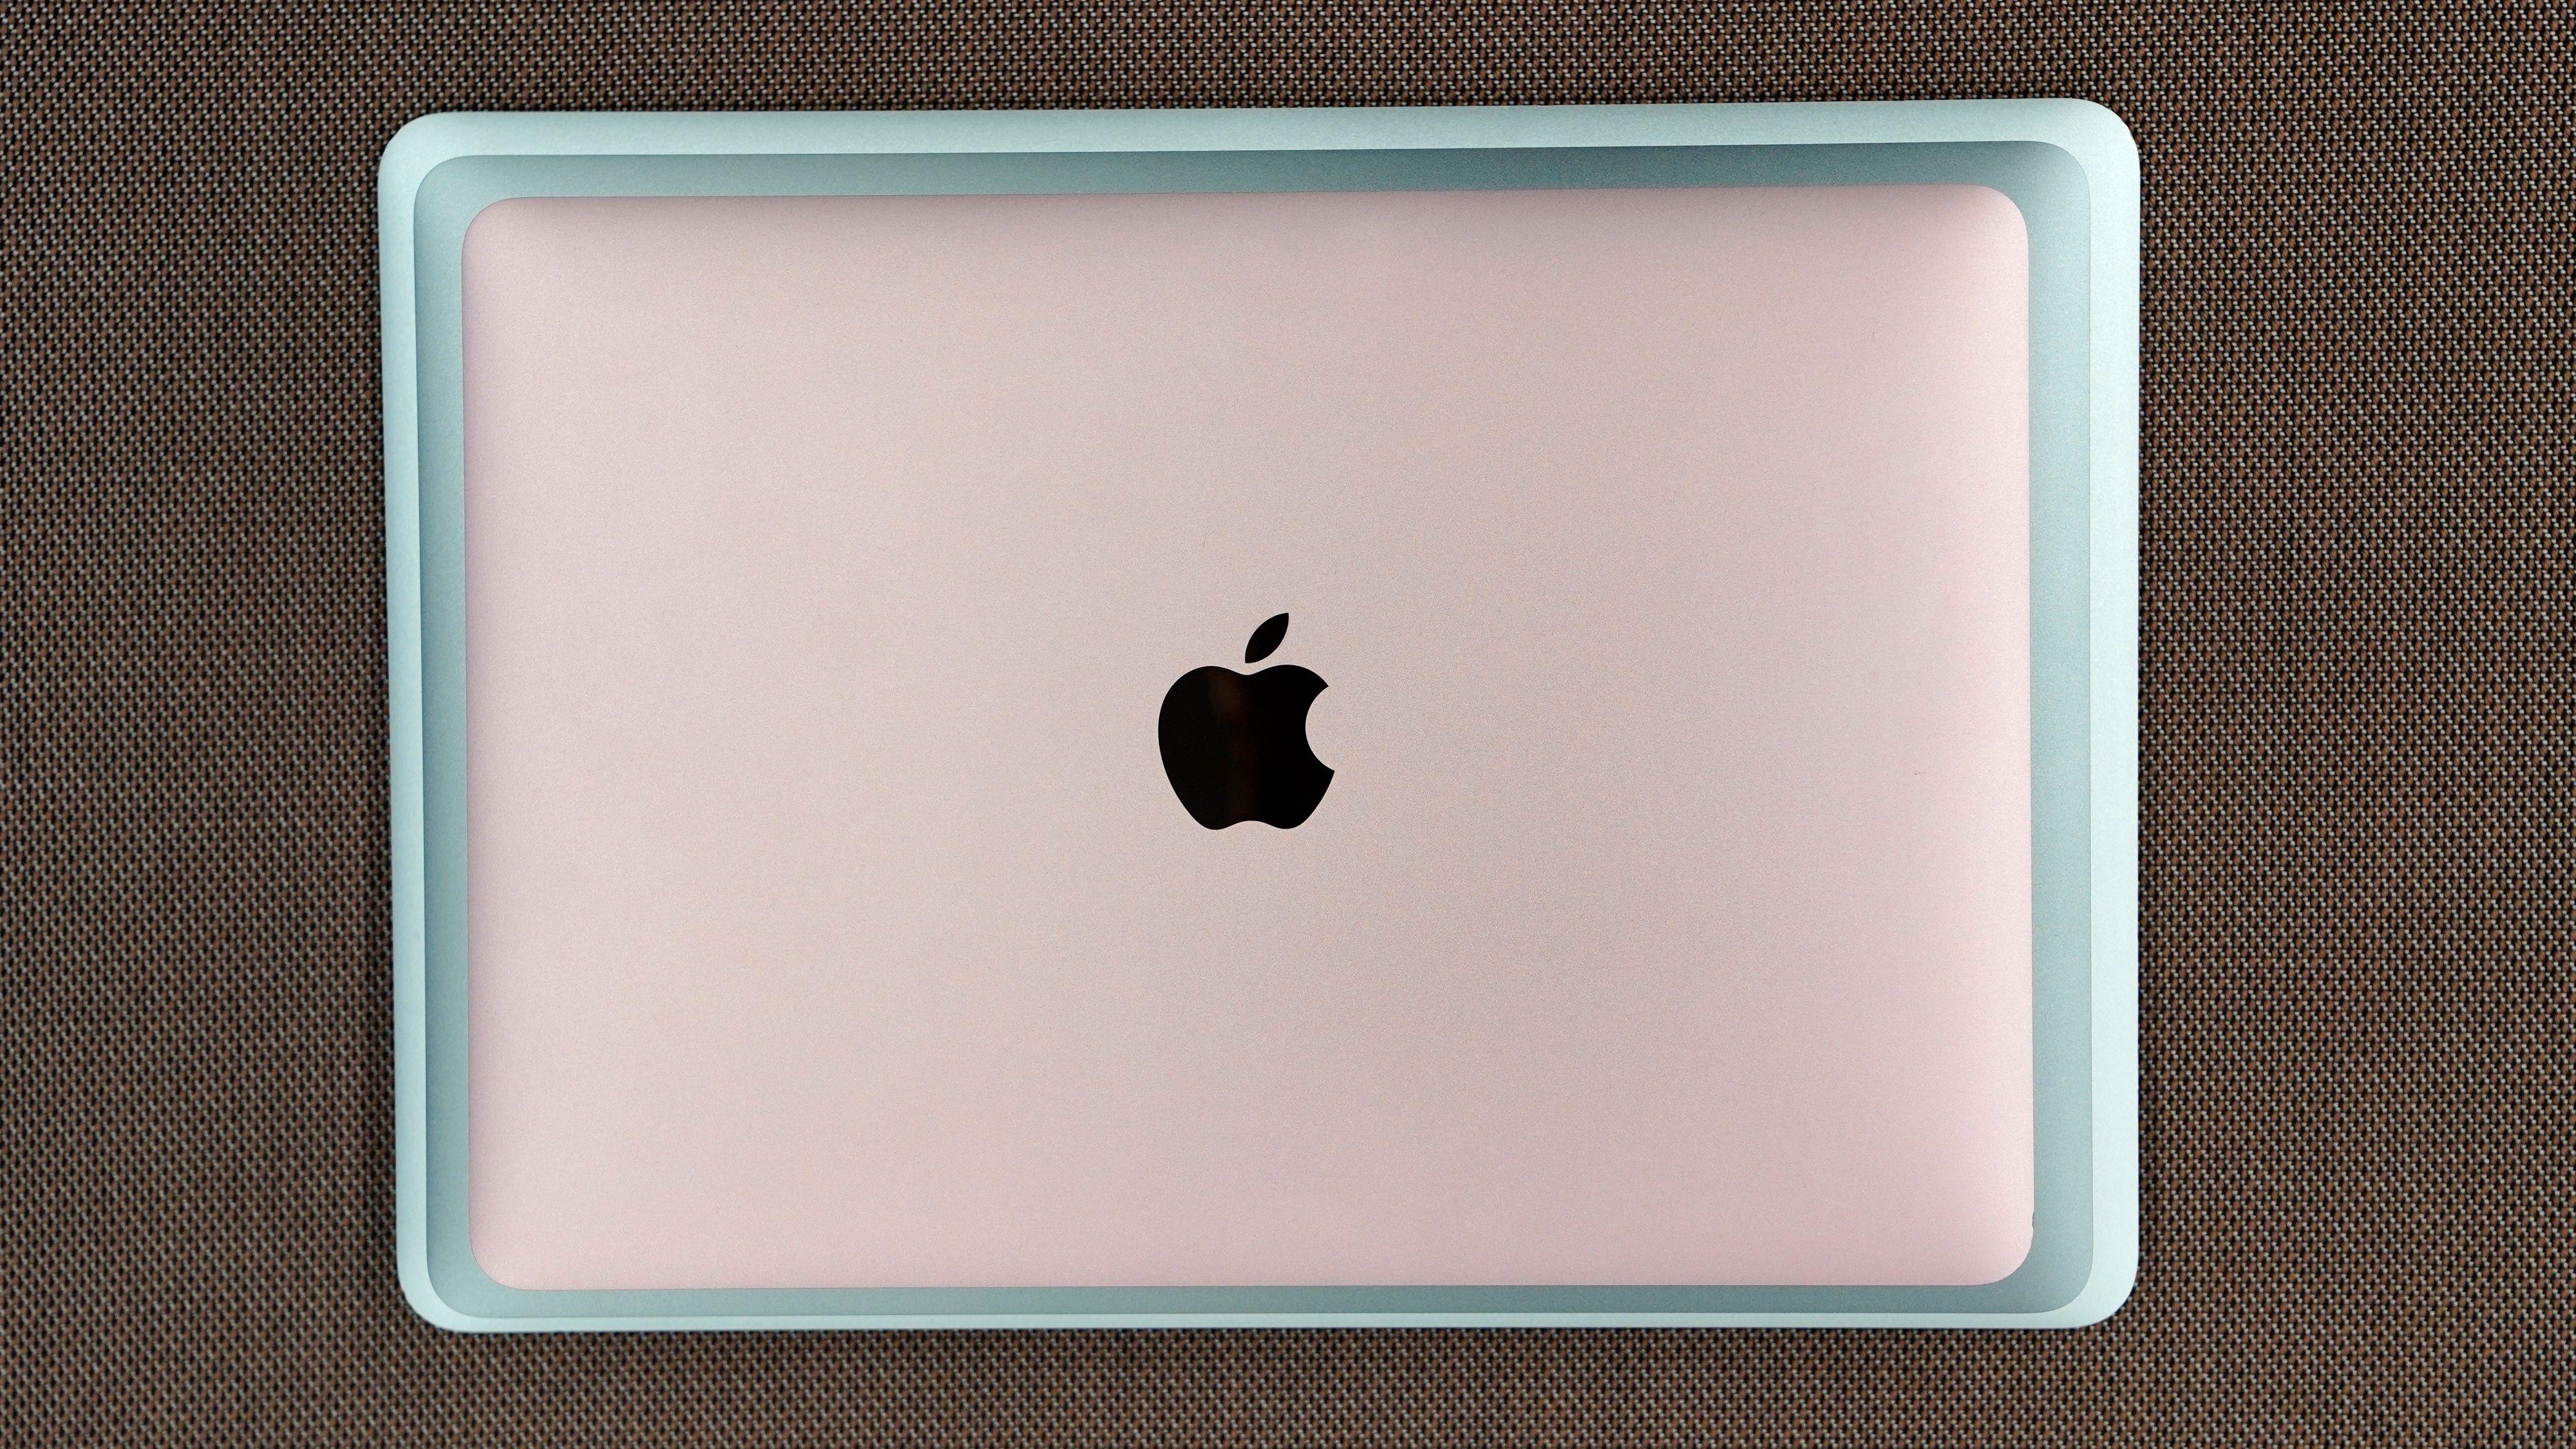 Fra topp til bunn: MacBook, nye MacBook Air, gamle MacBook Air.